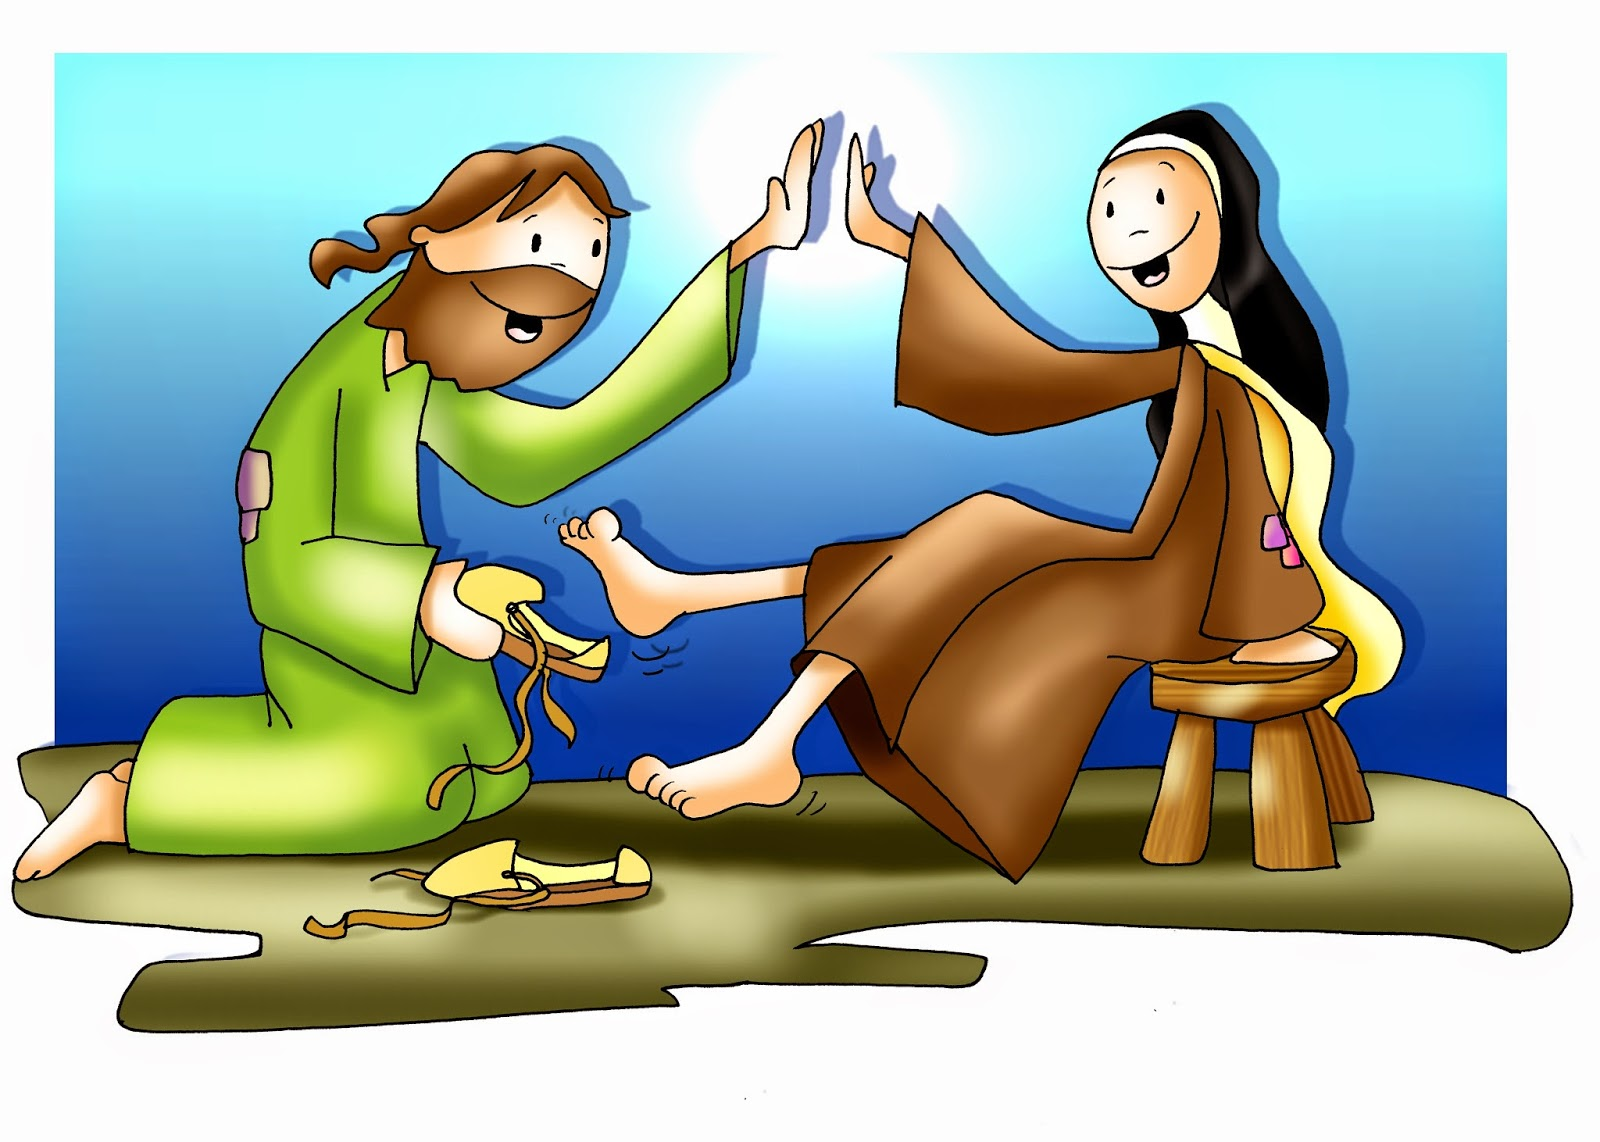 SANTA TERESA DE JESUS: Imágenes de FANO de santa Teresa de Avila